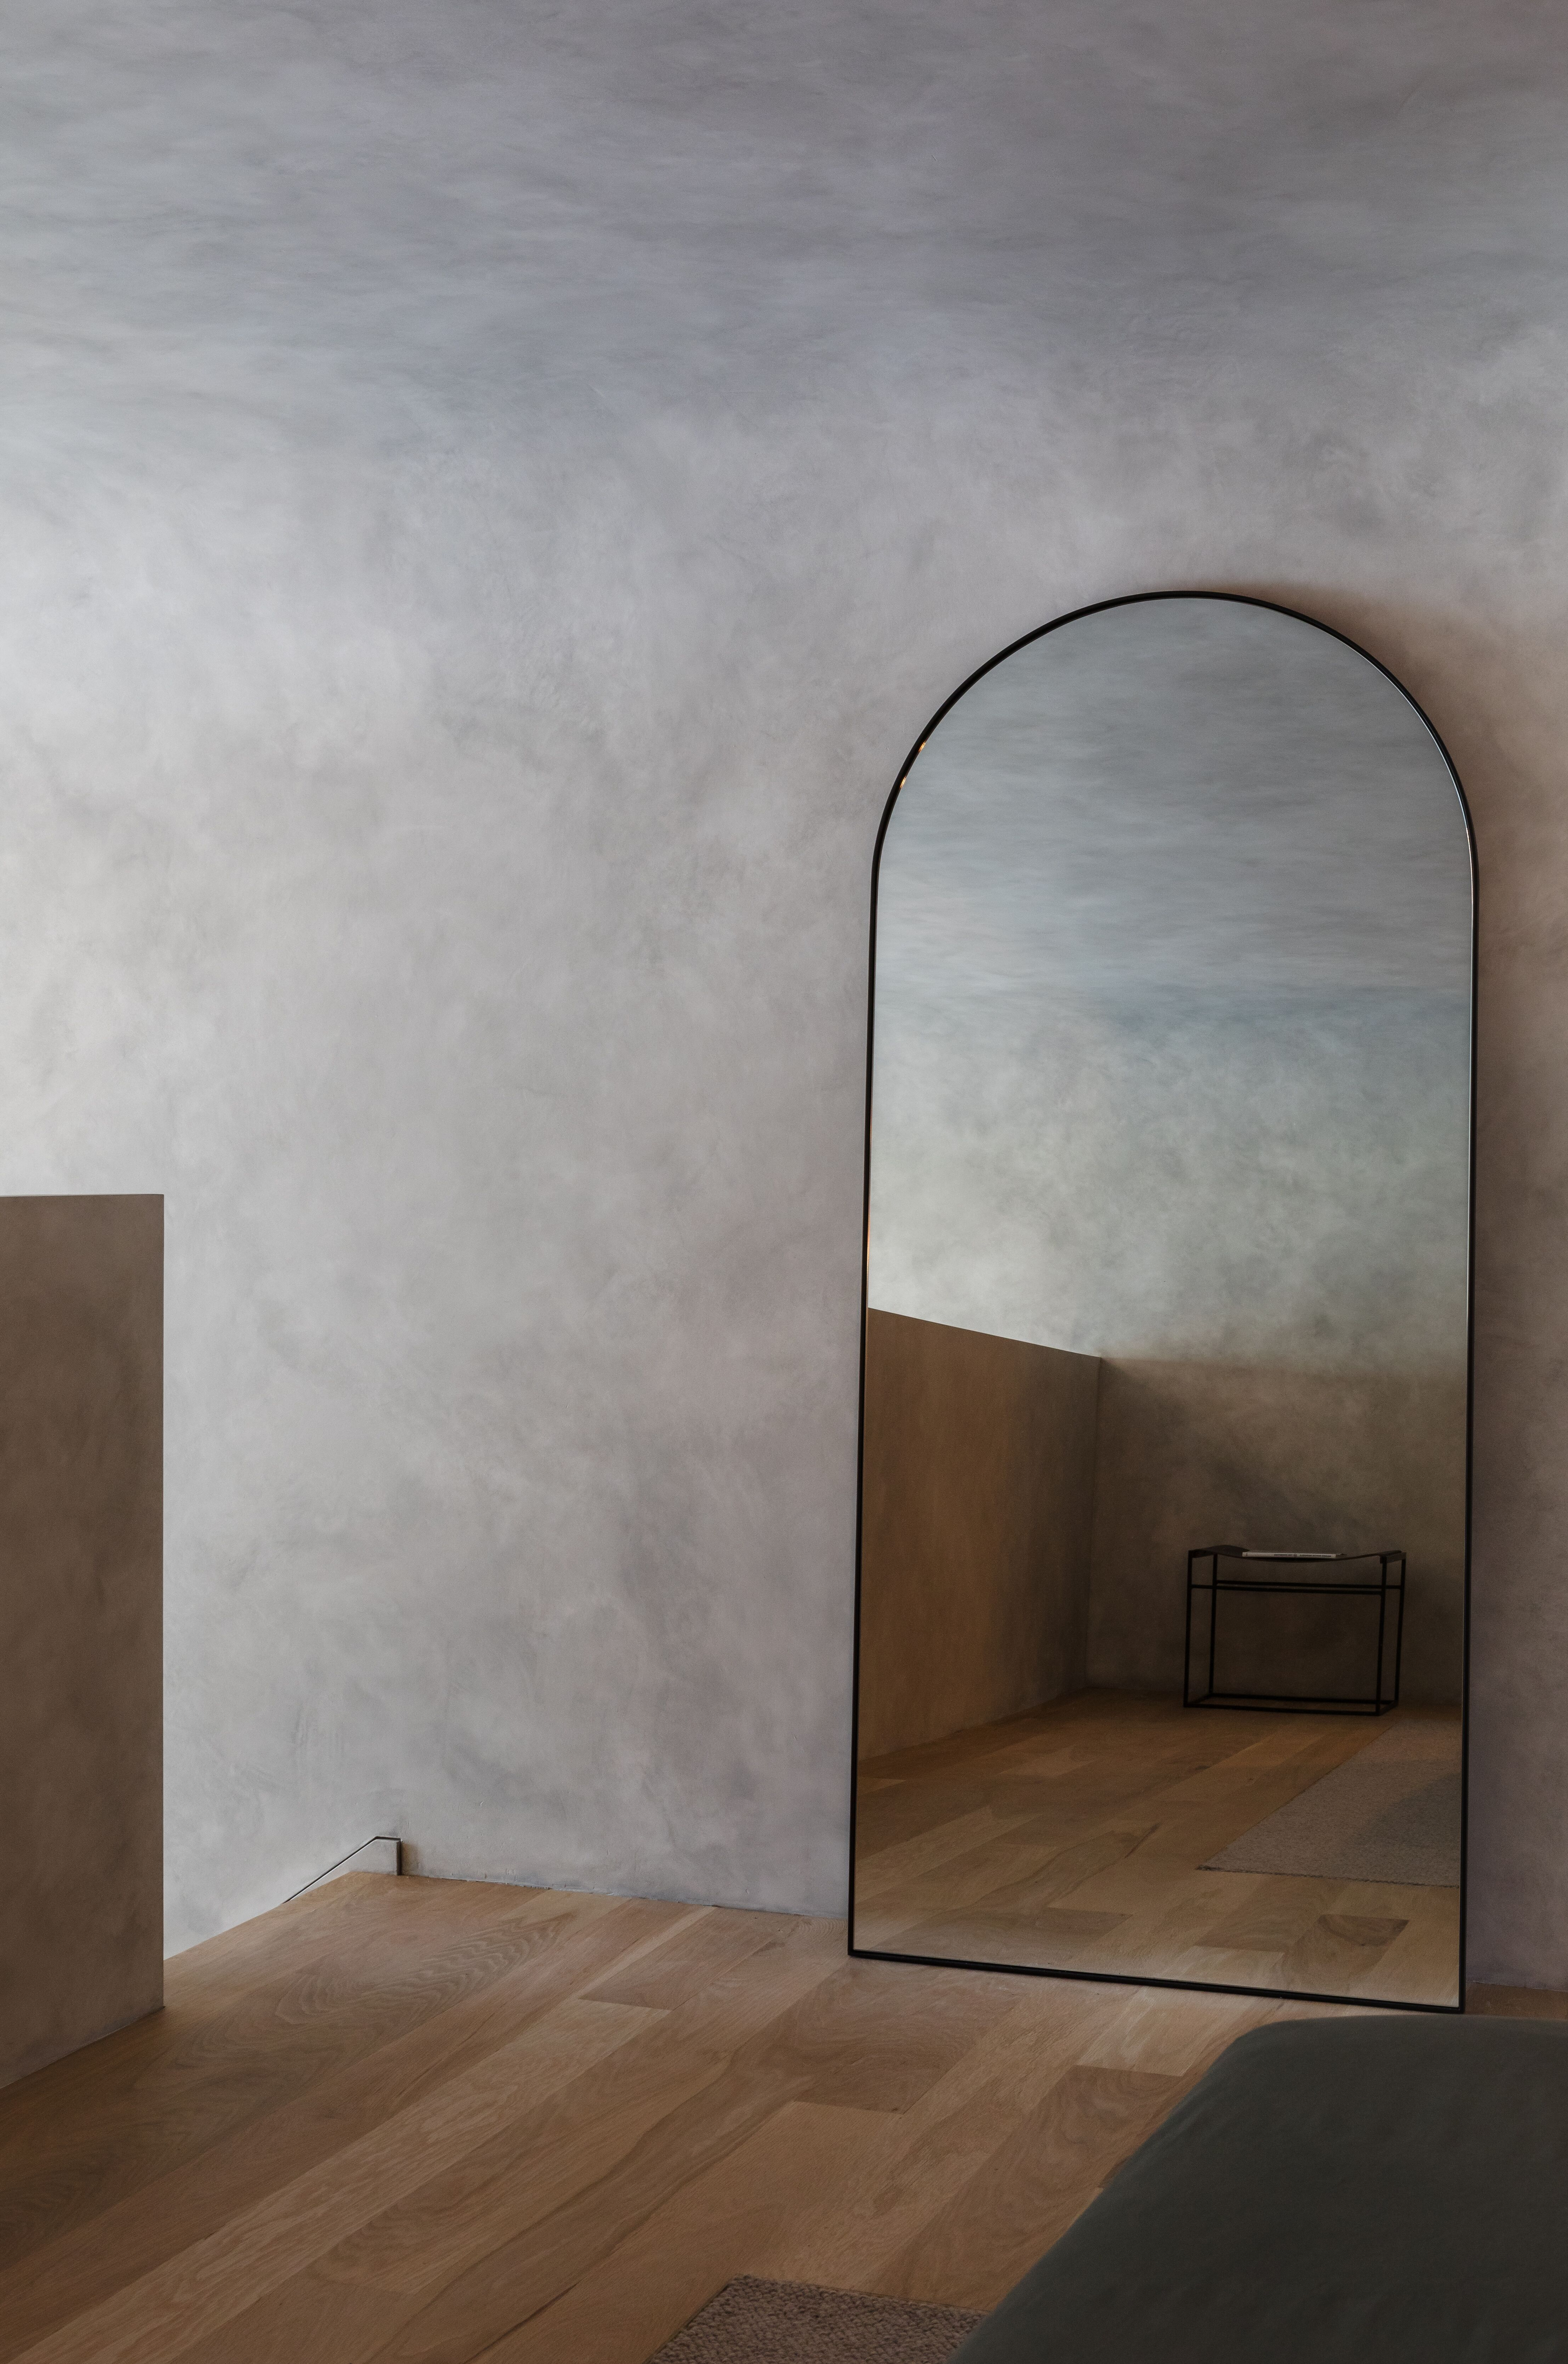 A Concrete Bunker Perfect Storm Apartment Renovation About Design World Residential Interior Design Concrete Interiors Glazed Walls